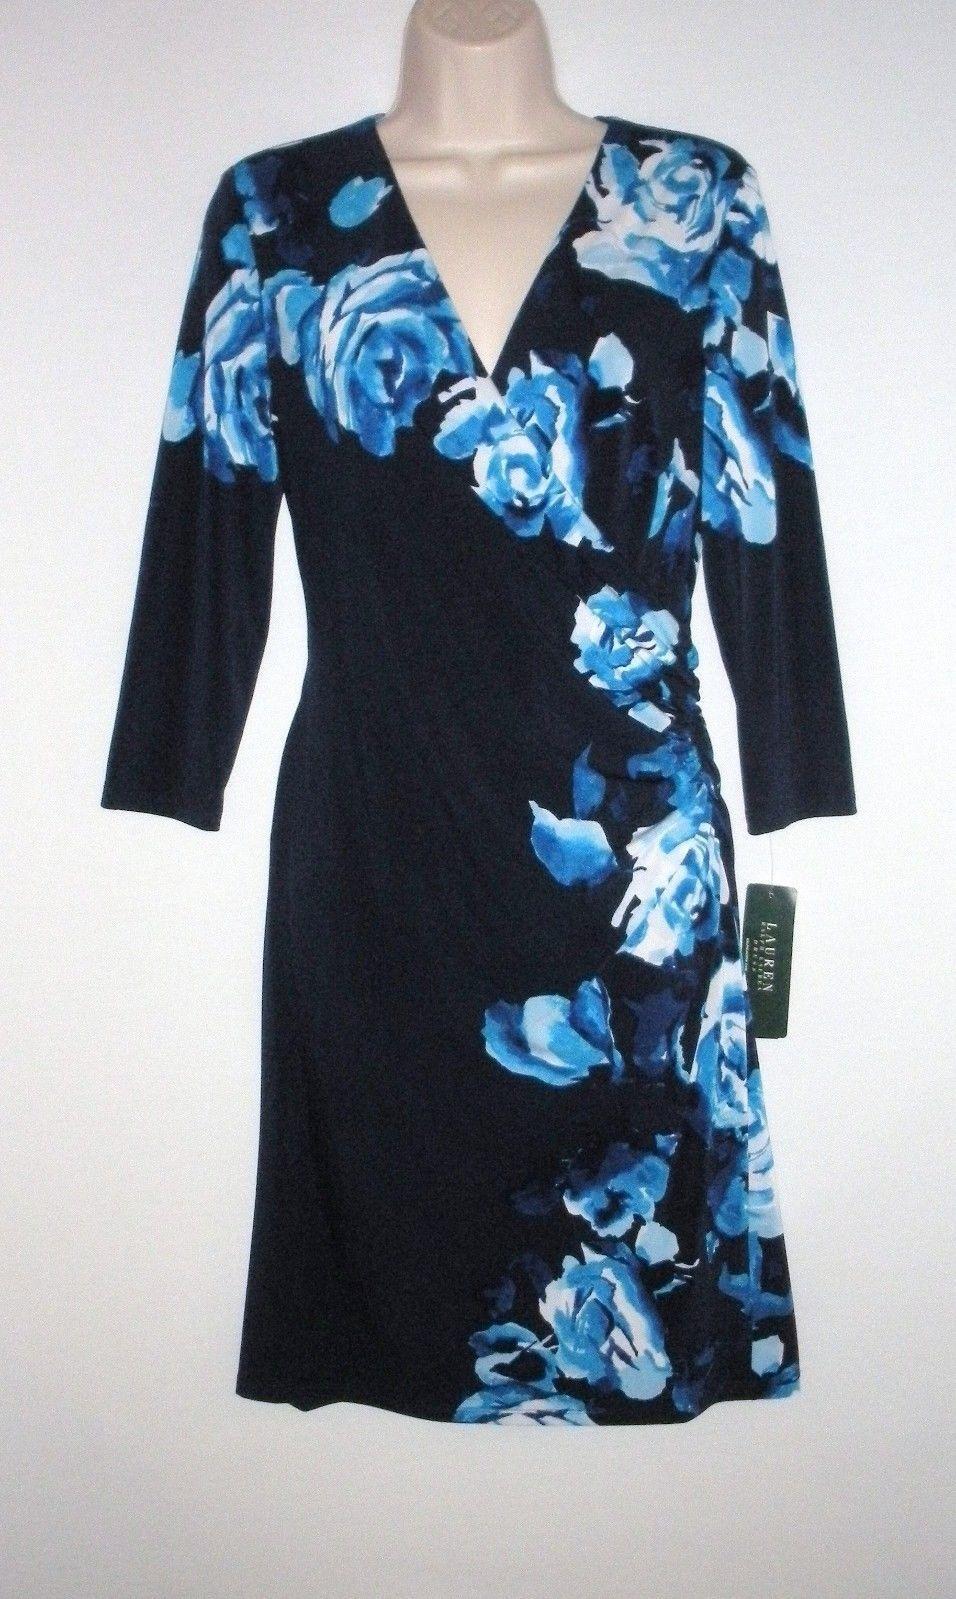 NWT MSRP  - LAUREN RALPH LAUREN Floral 3 4 Sleeve Jersey Dress, bluee Multi